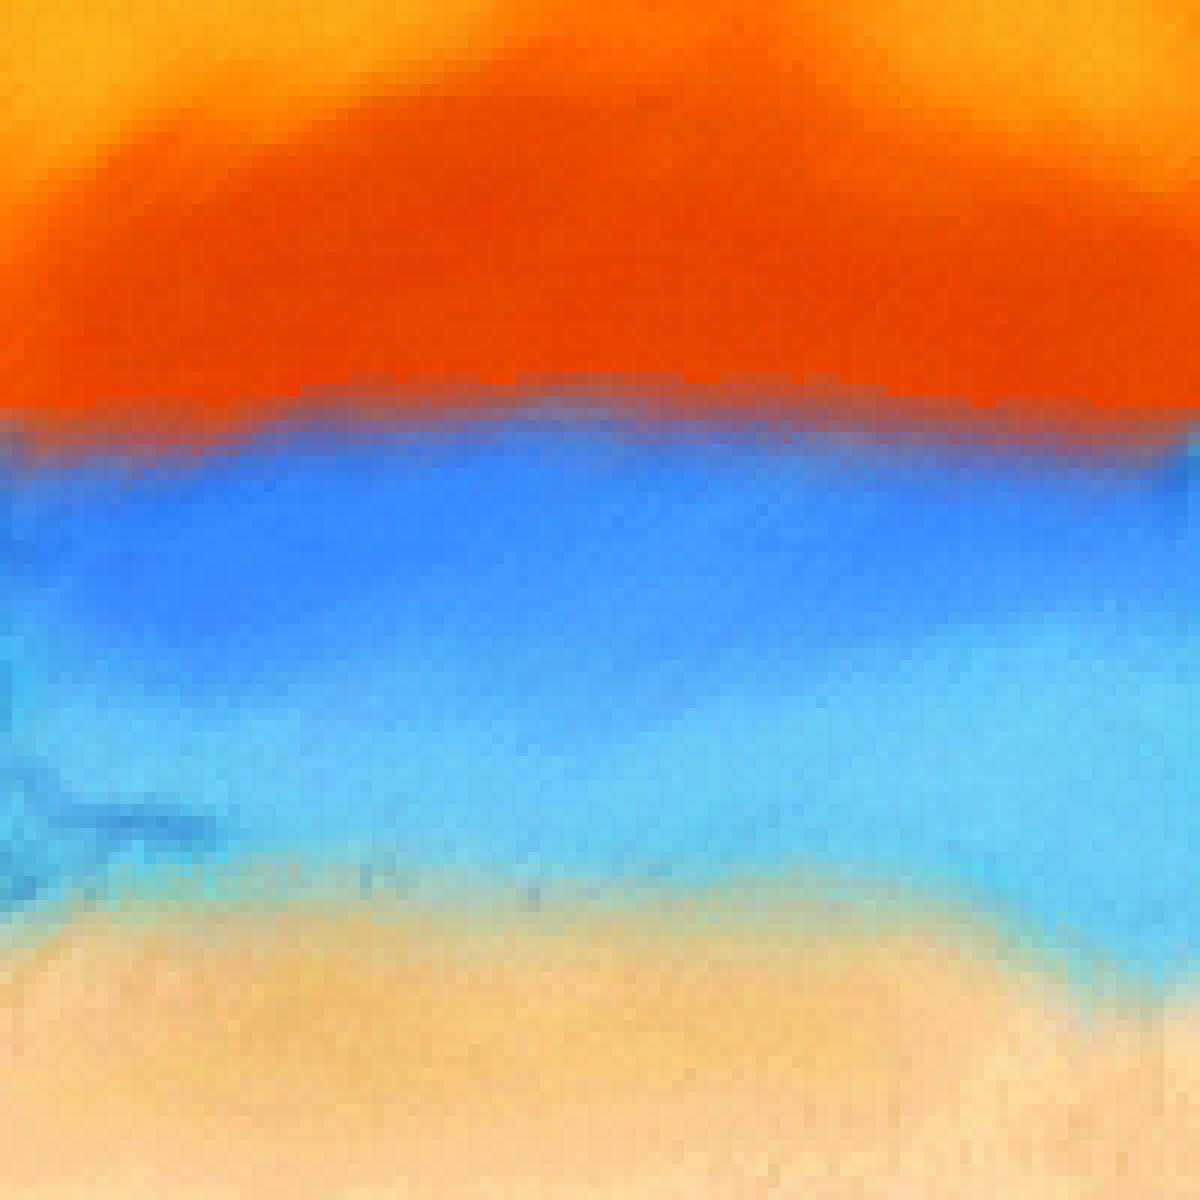 sunset  by Zyragoon